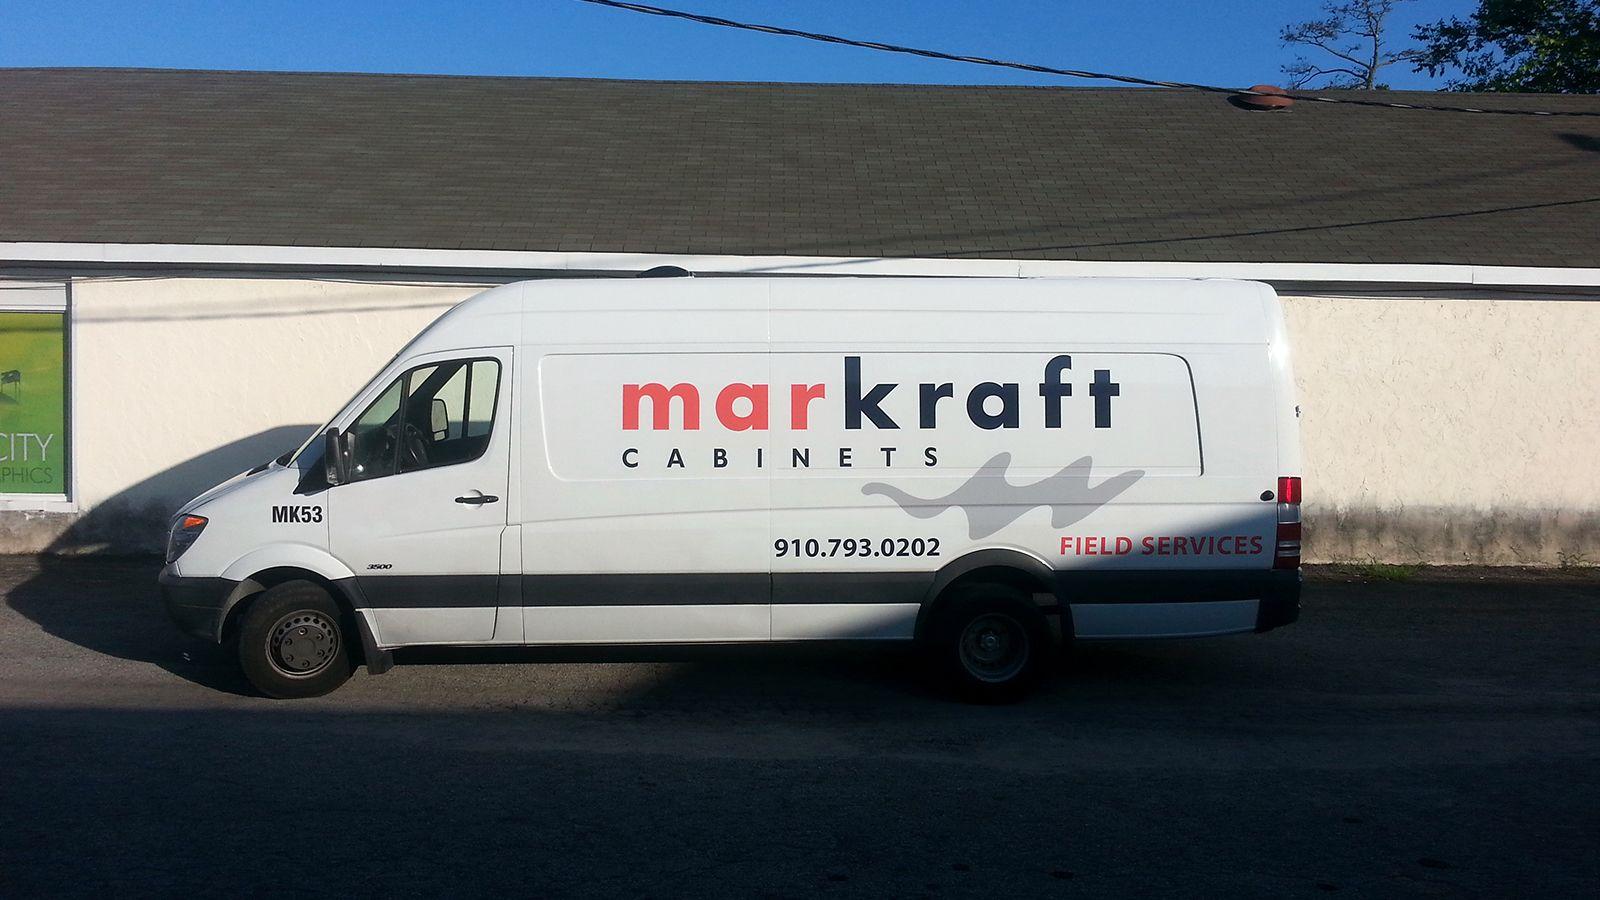 Markraft Cabinets print and cut graphics